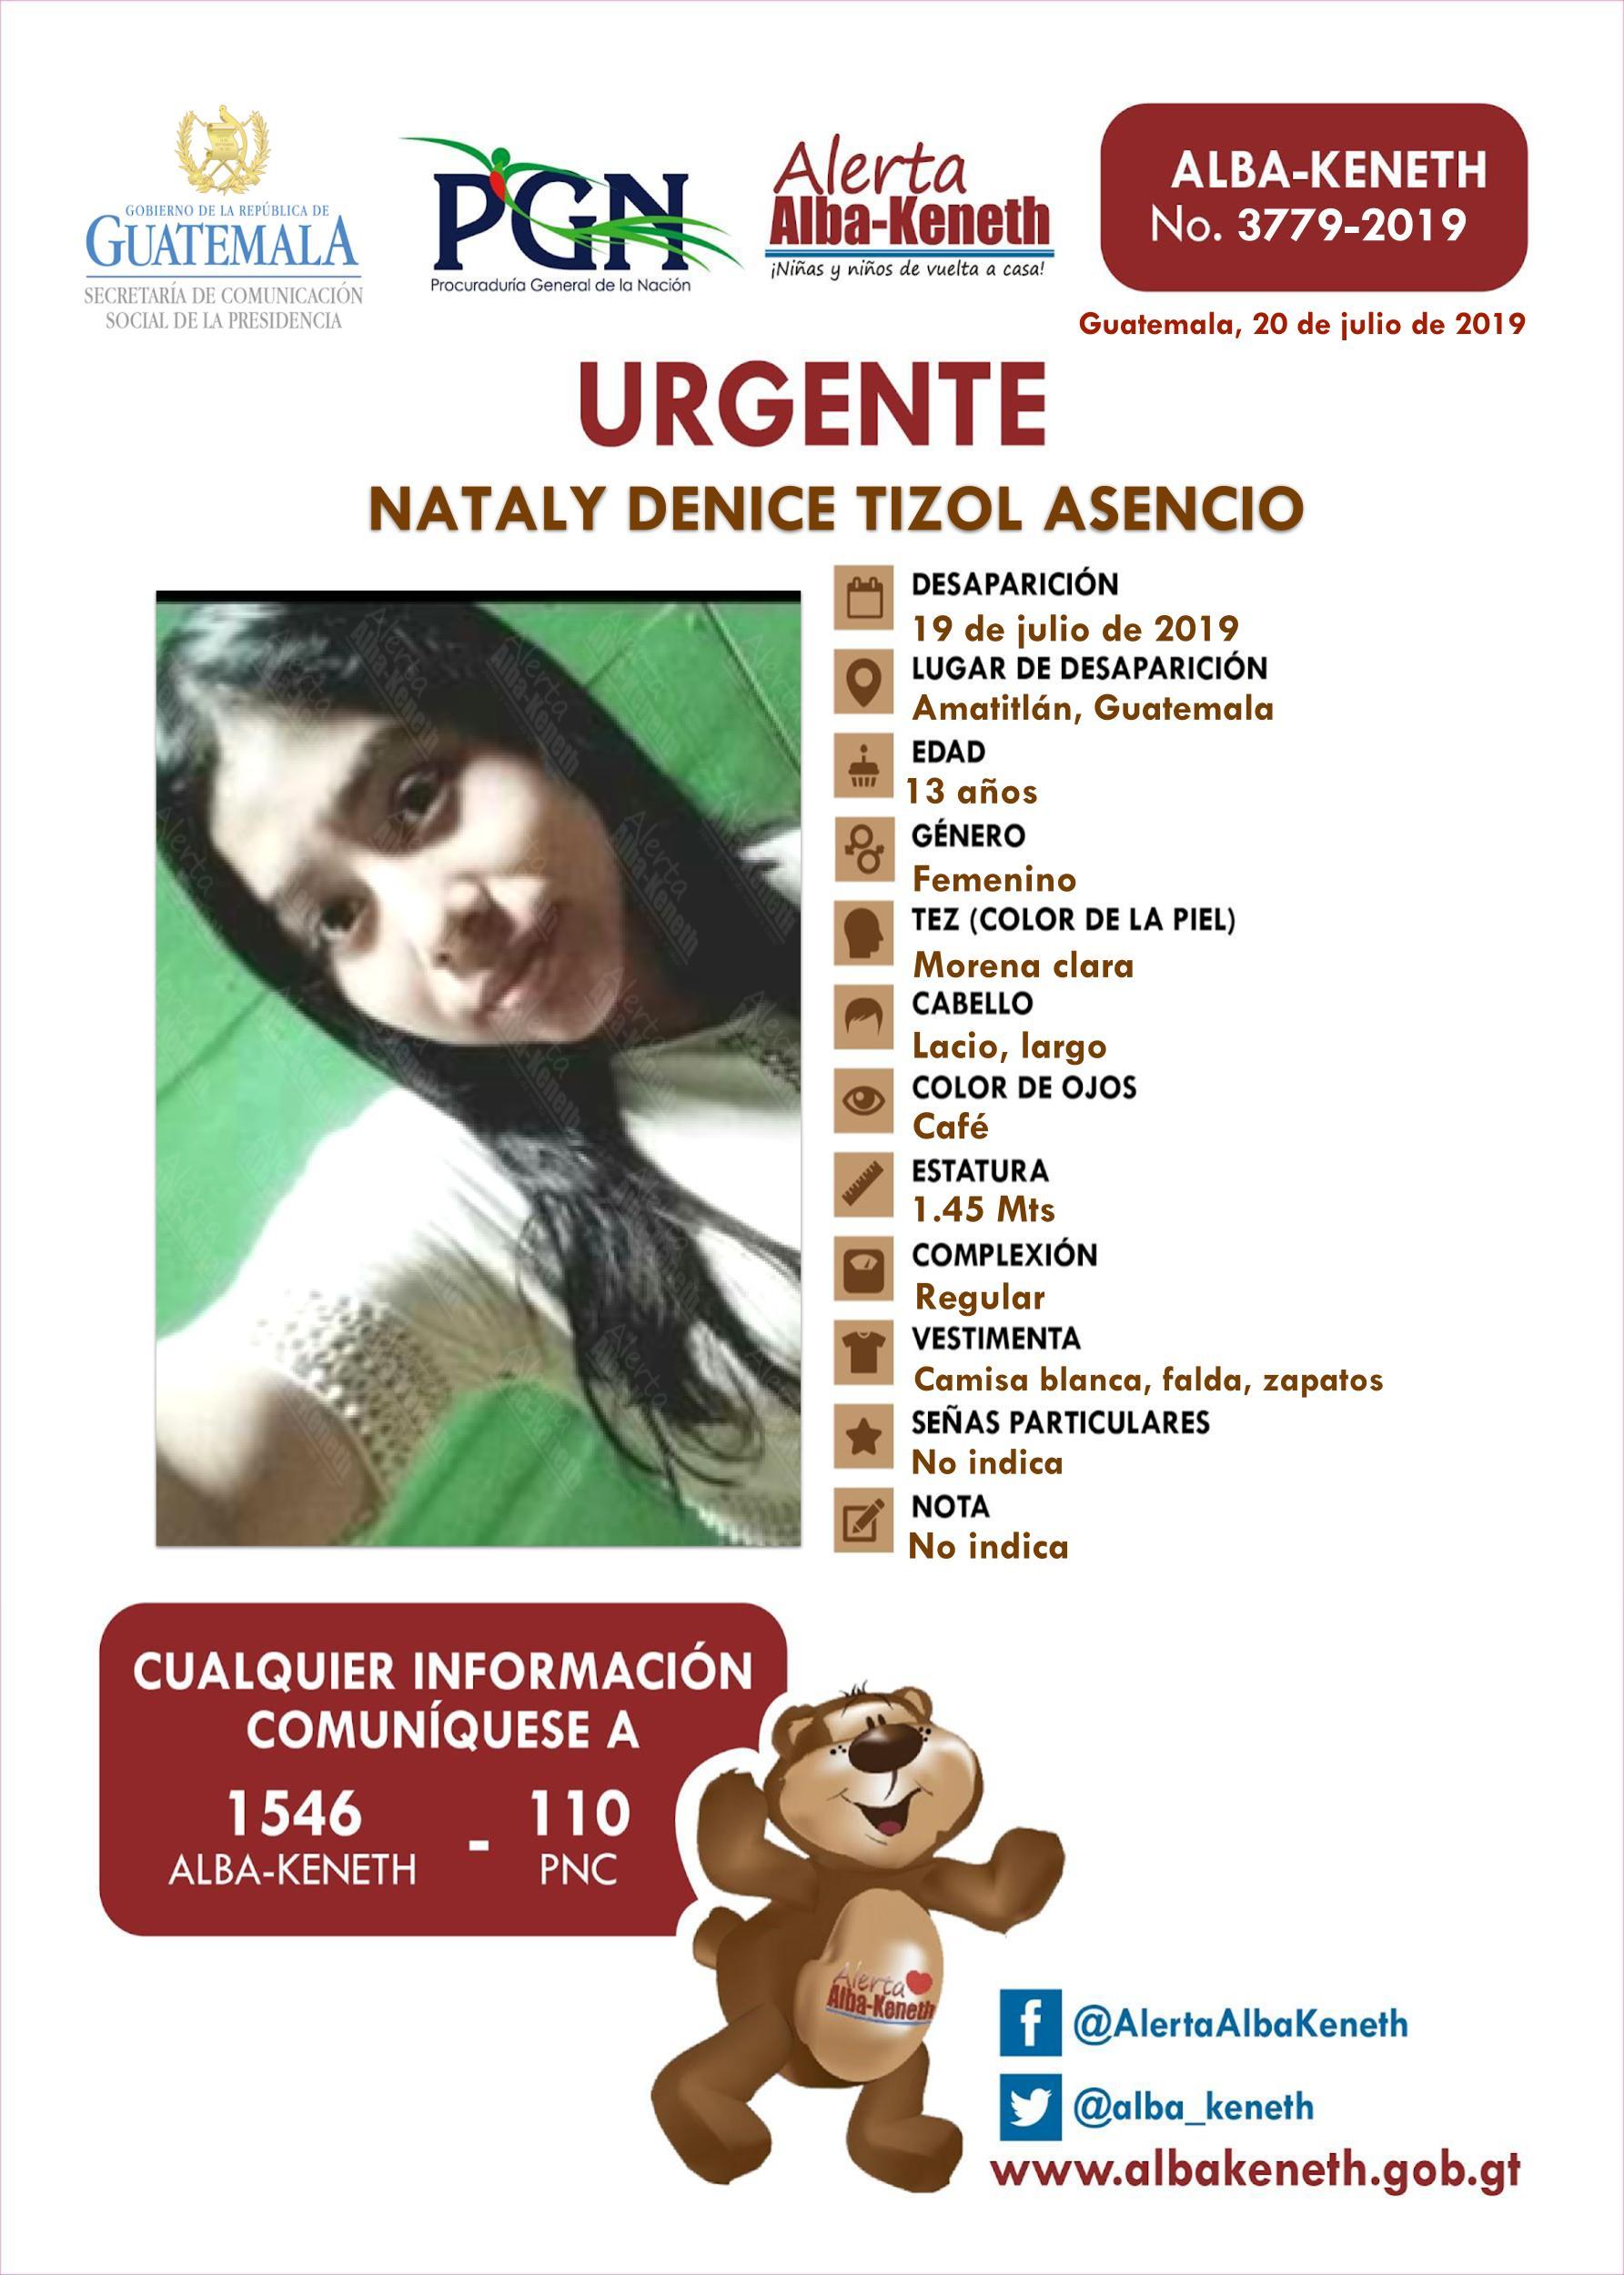 Nataly Denice Tizol Asencio